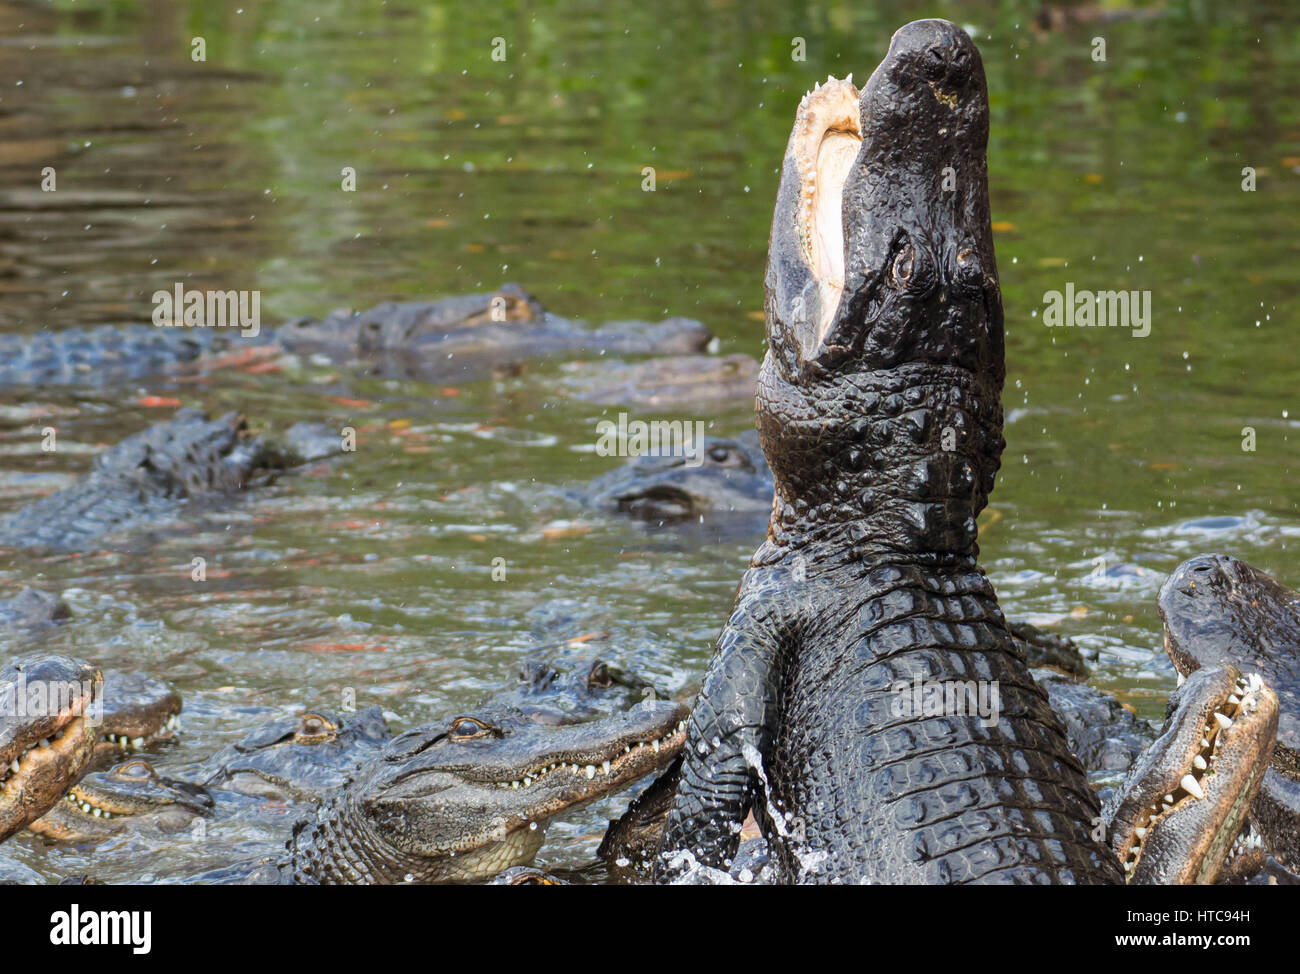 Leaping Feeding Hungry Alligator - Stock Image